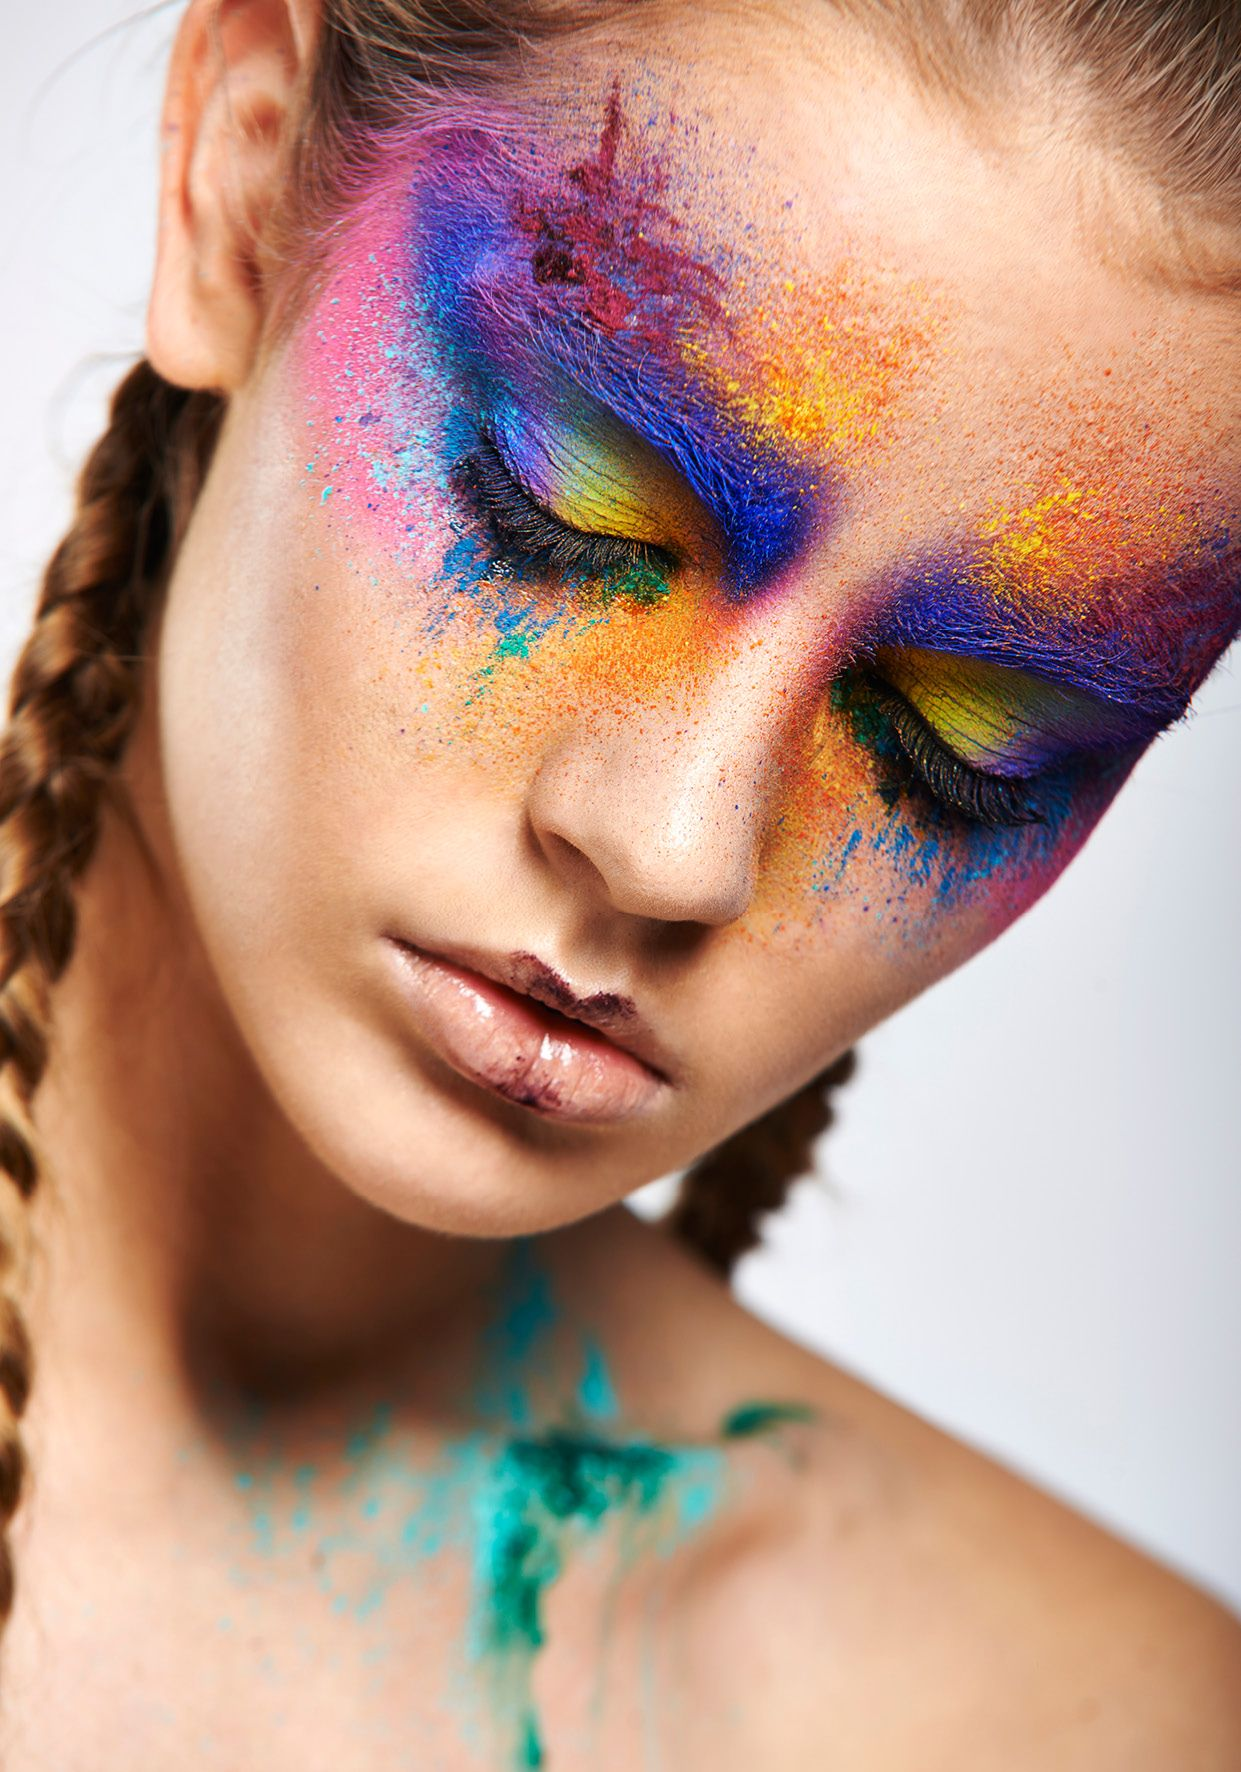 Cincinnati based freelance makeup artist, Down To Earth